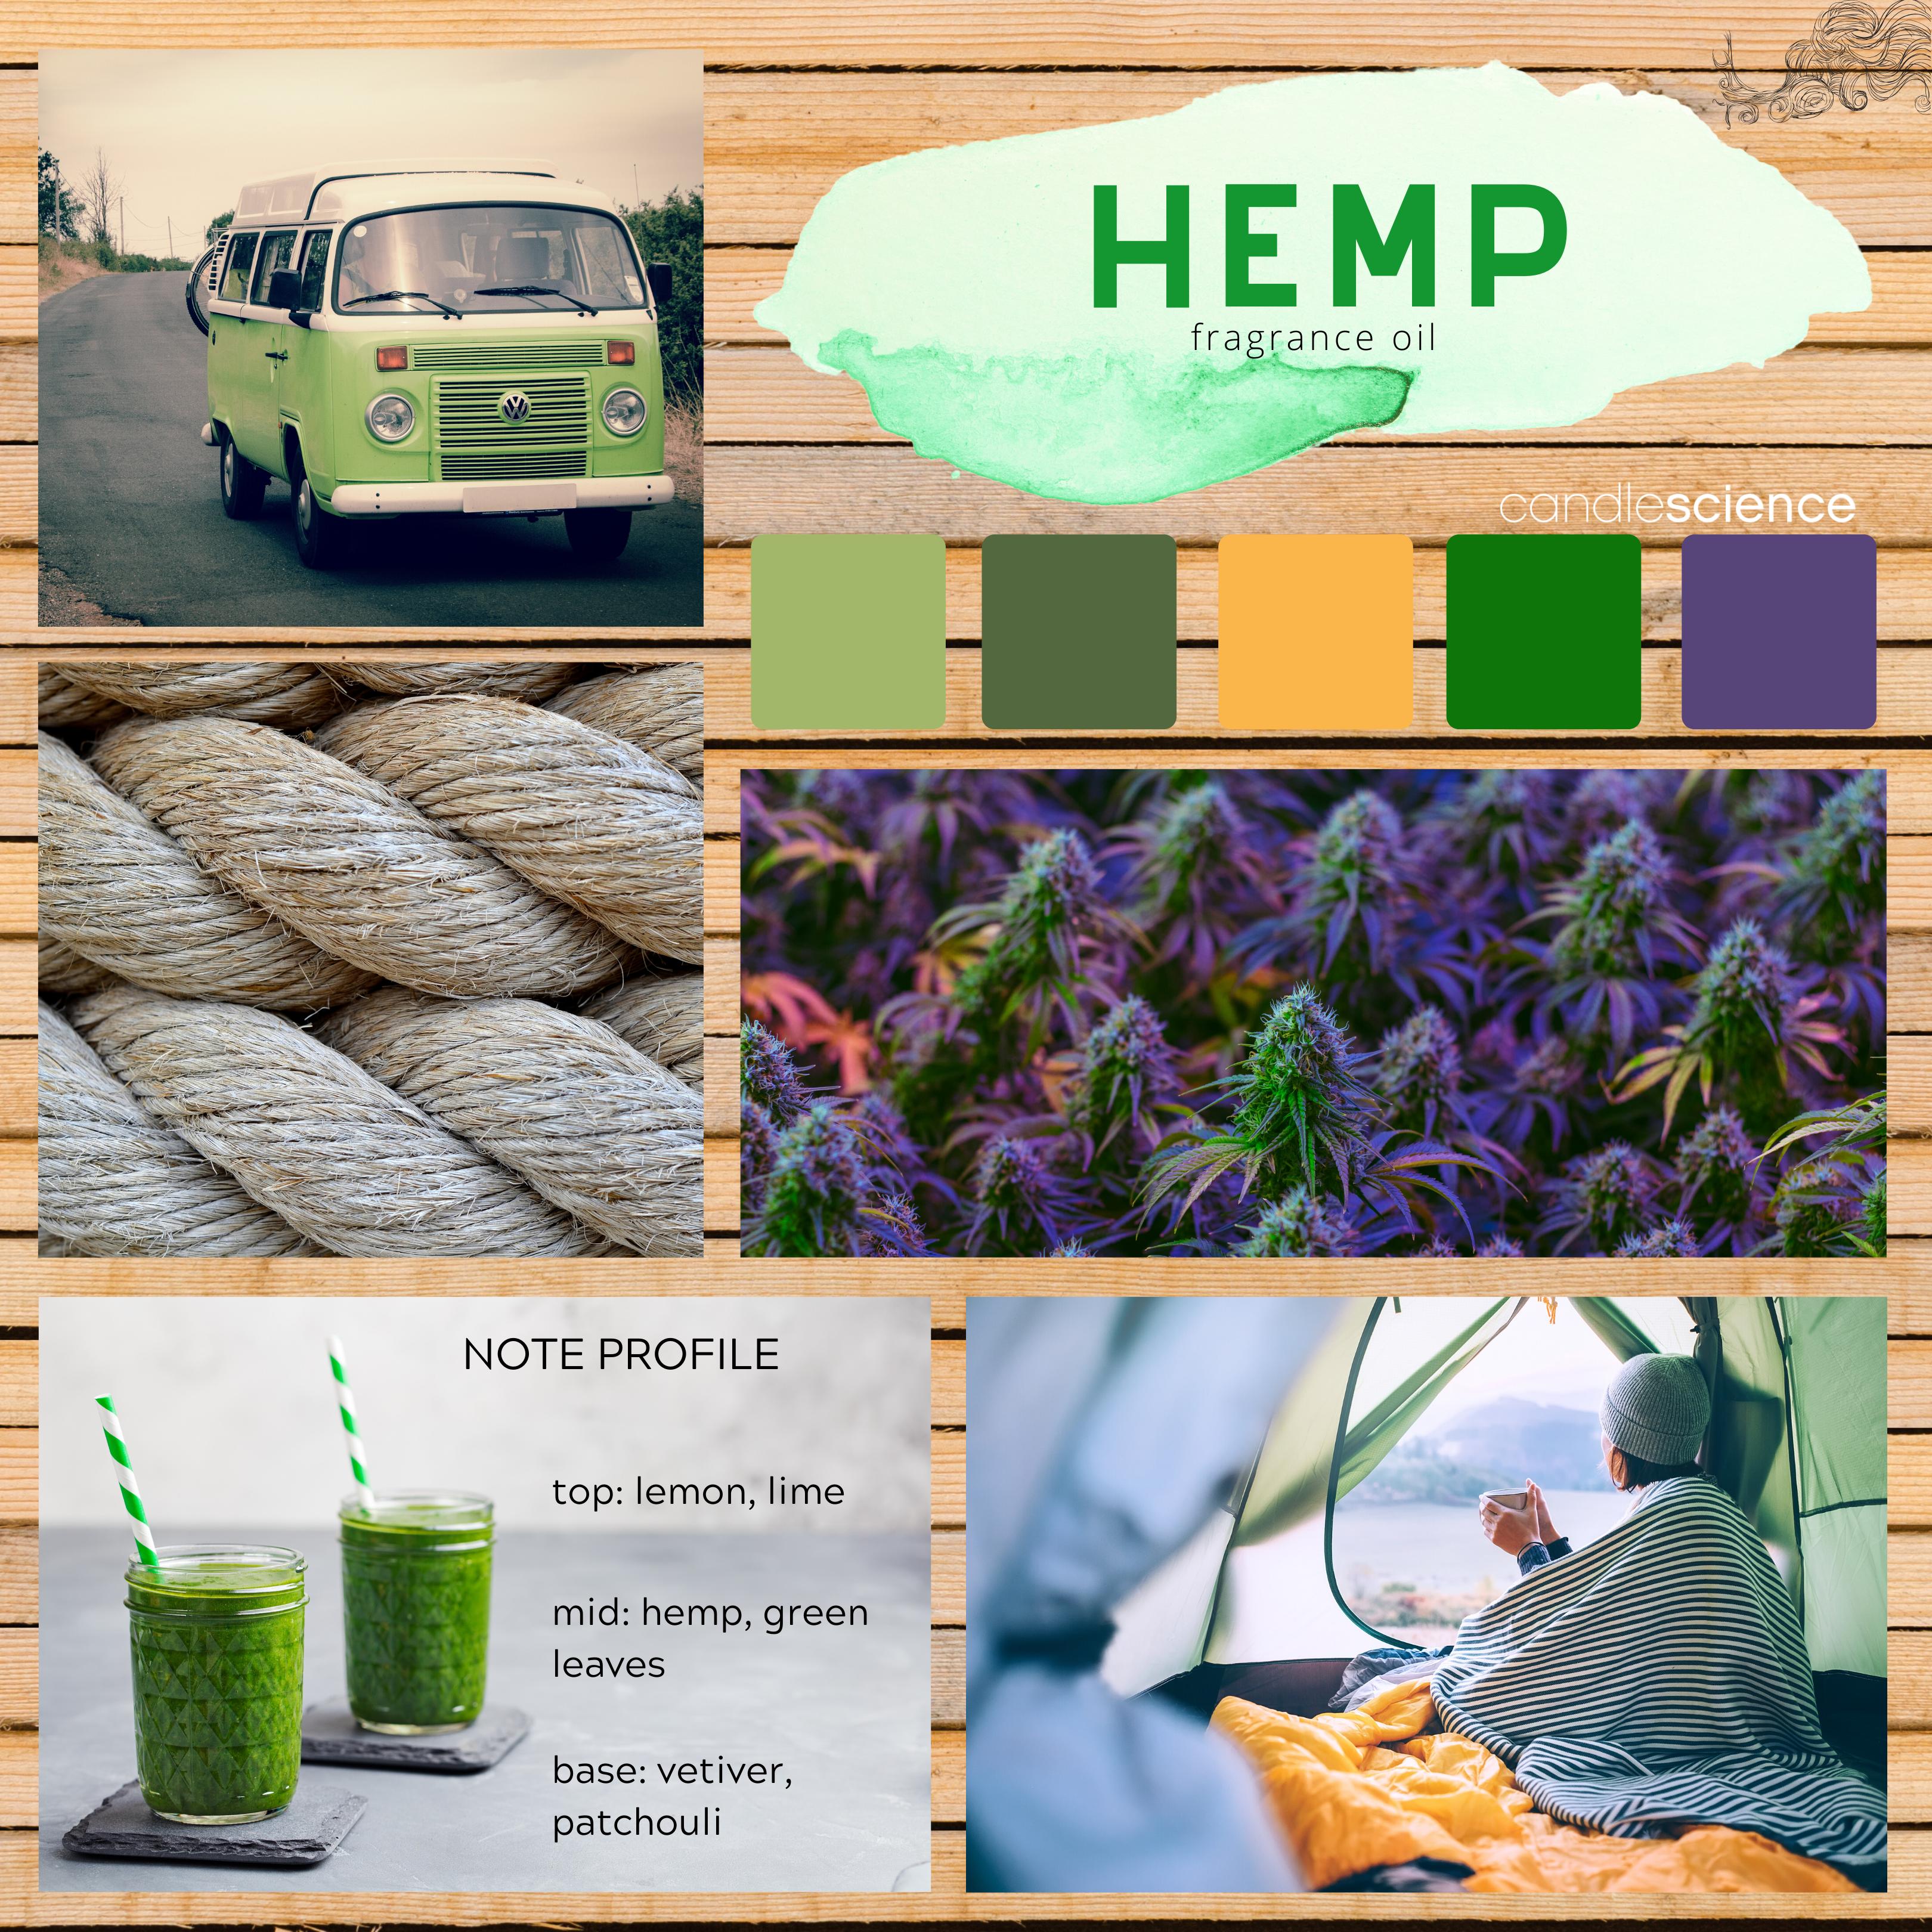 Hemp Fragrance Oil